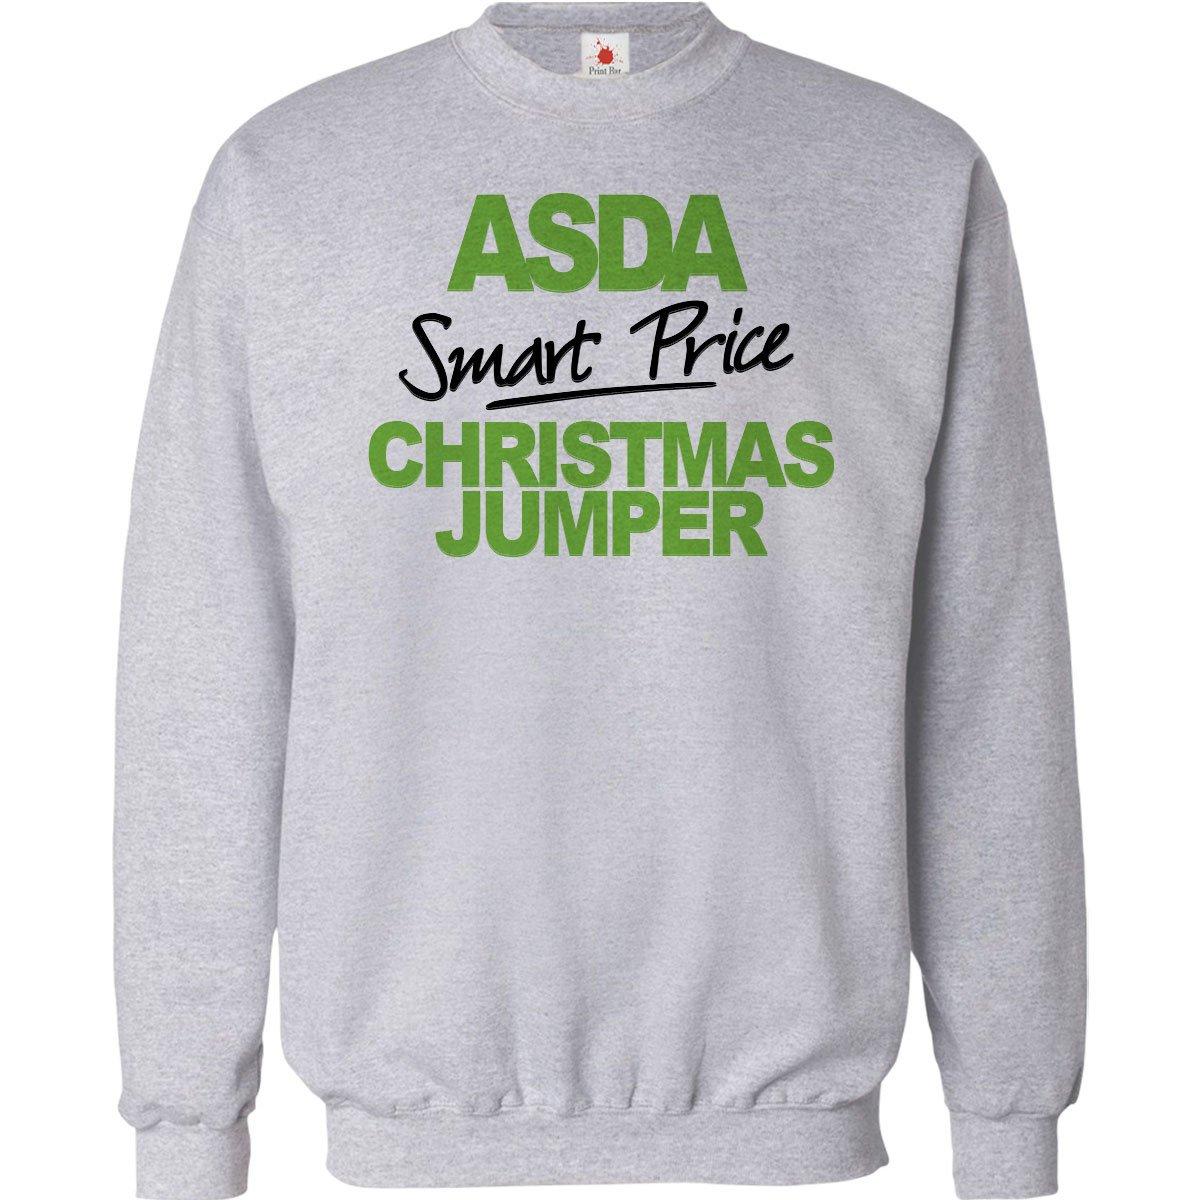 Funny Christmas Jumper Asda Smart Price Unisex Xmas